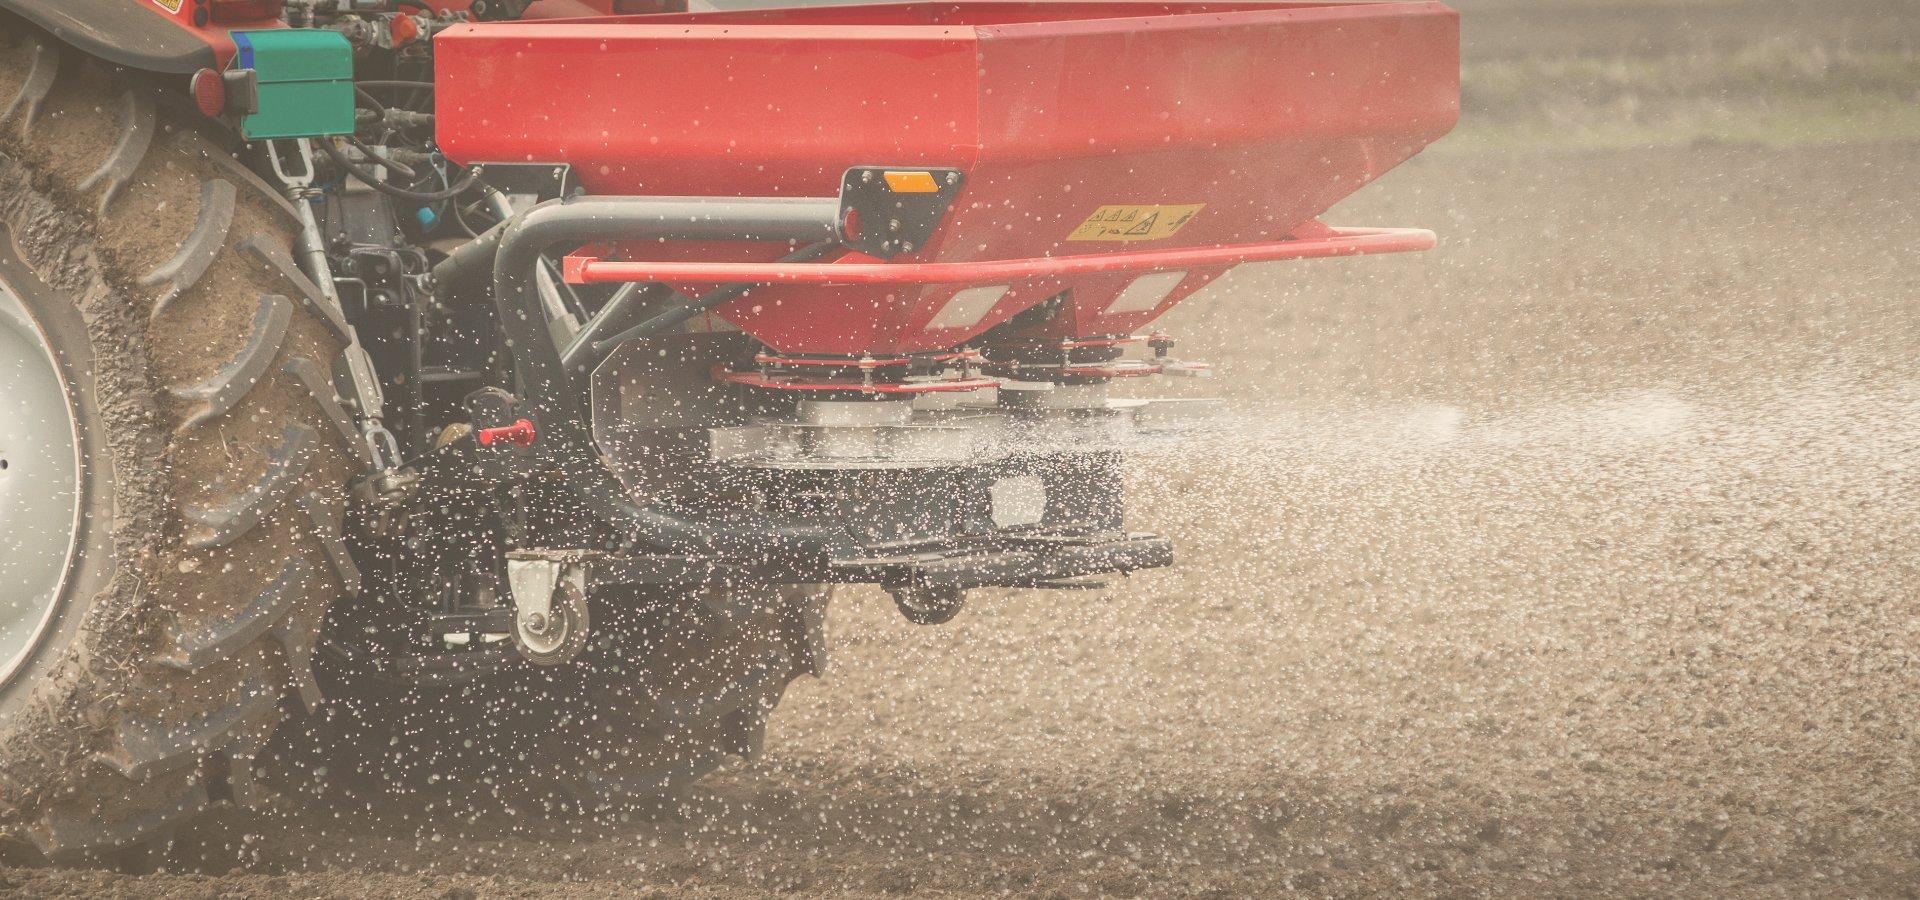 Farm Equipment - Fertilizer Spreaders